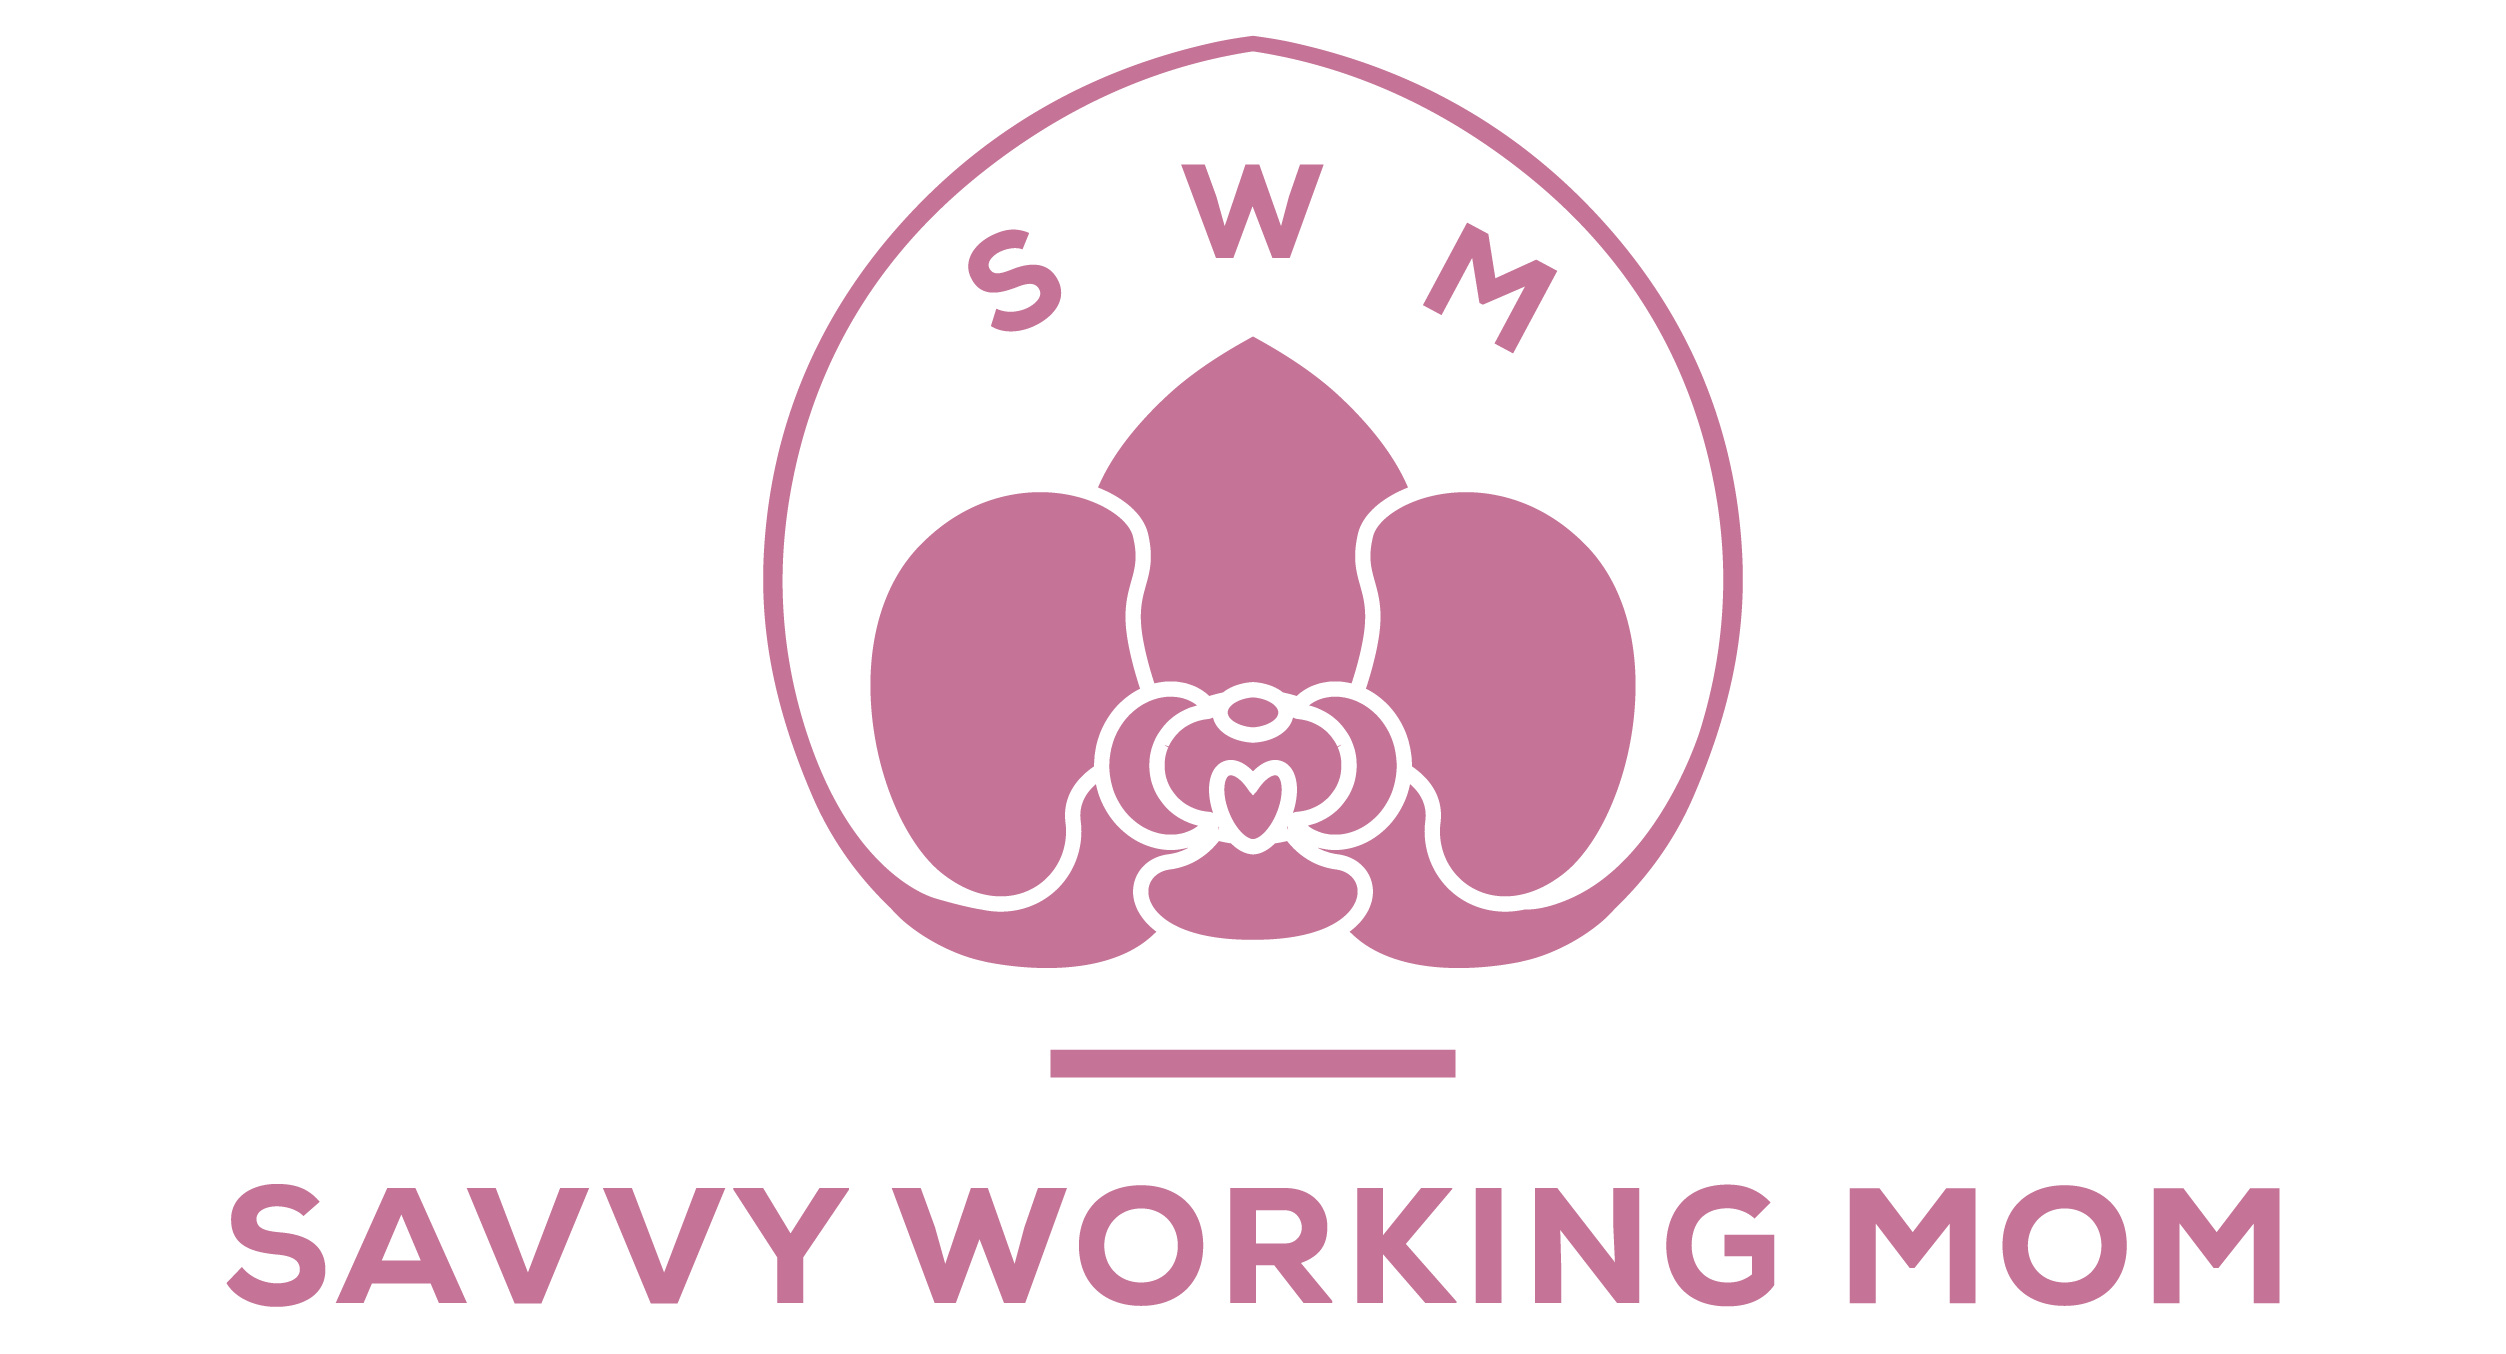 The Savvy Working Mom